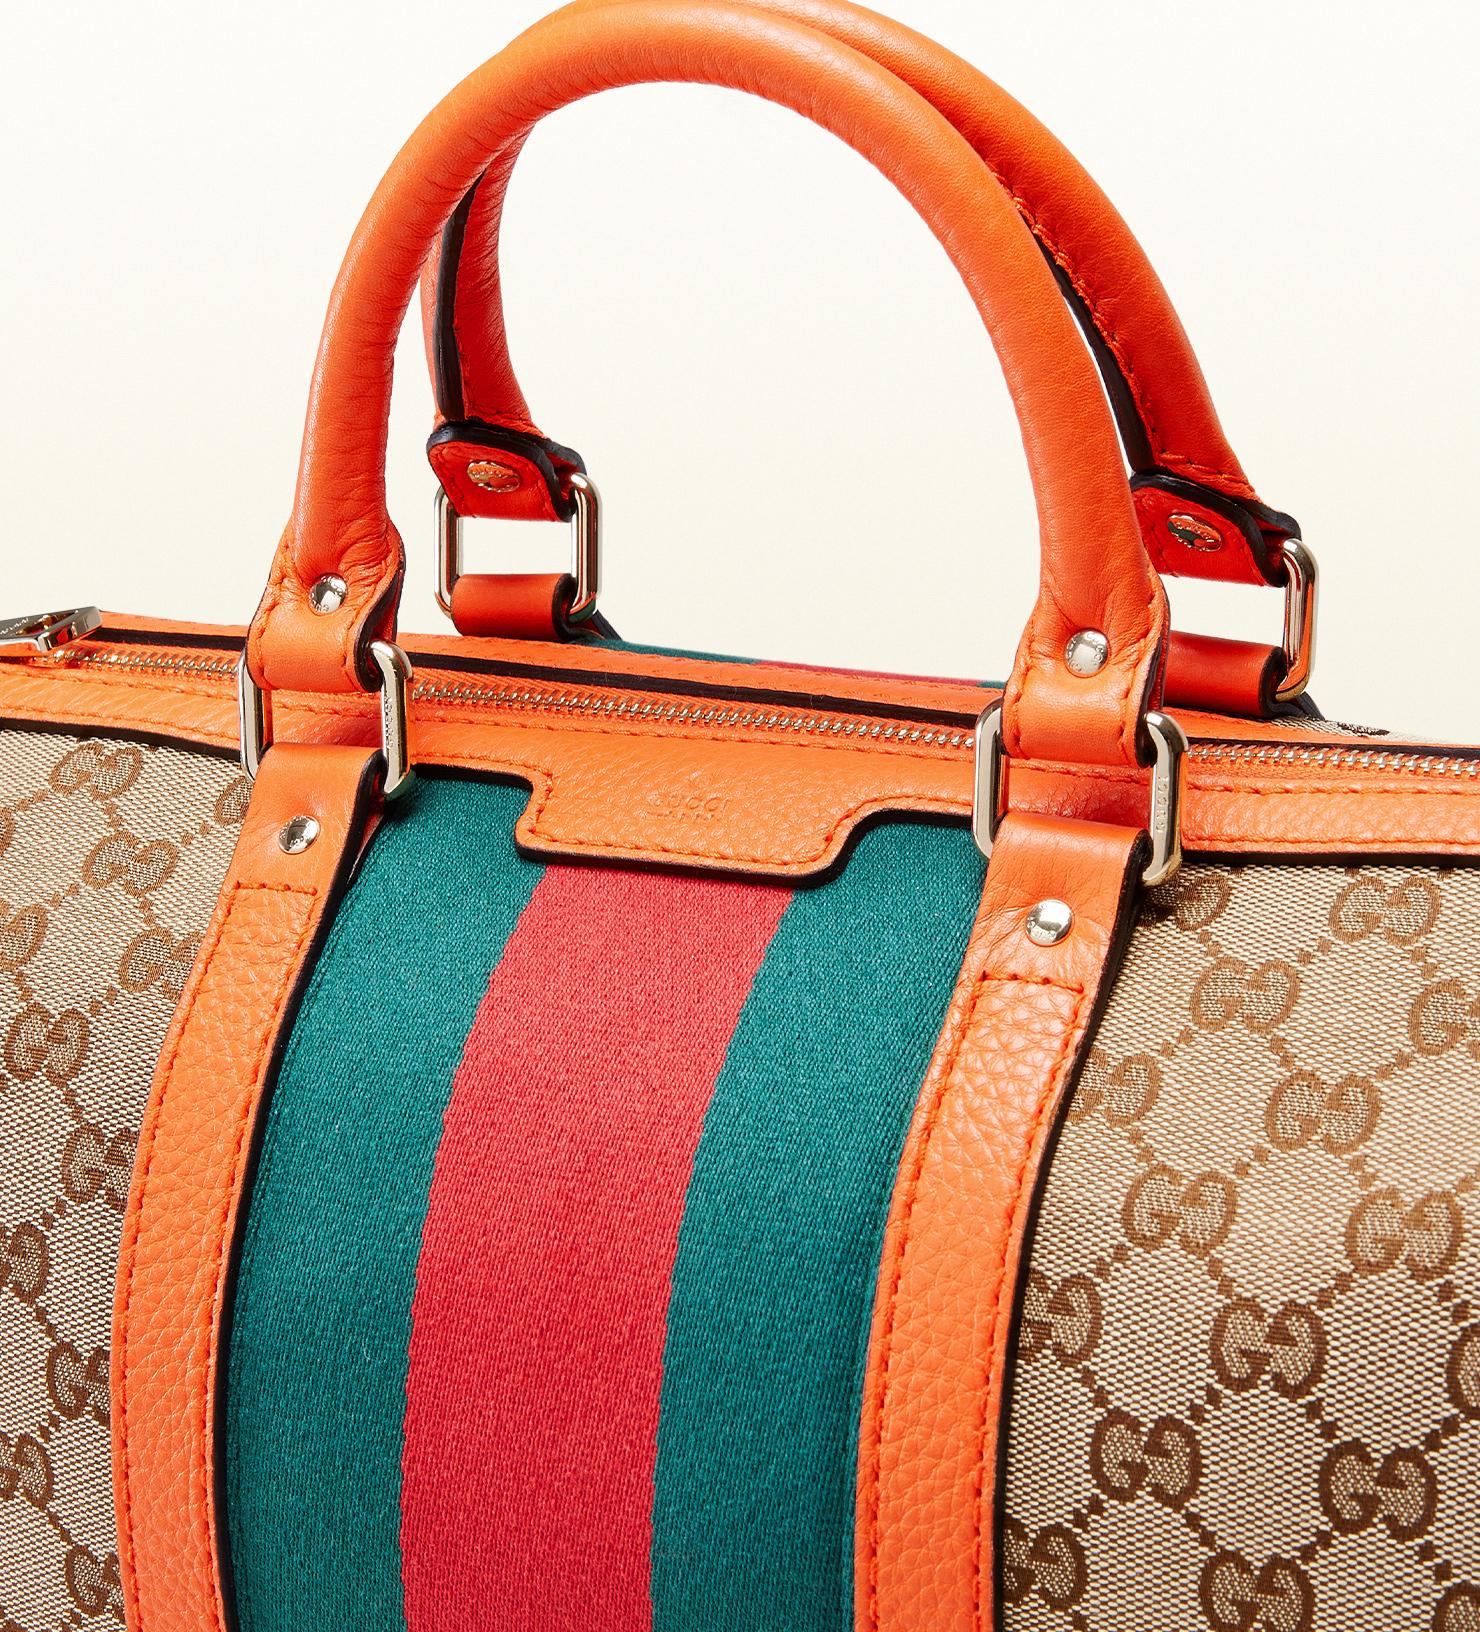 b15456603ba222 Gucci Vintage Web Original Gg Canvas Boston Bag in Orange - Lyst